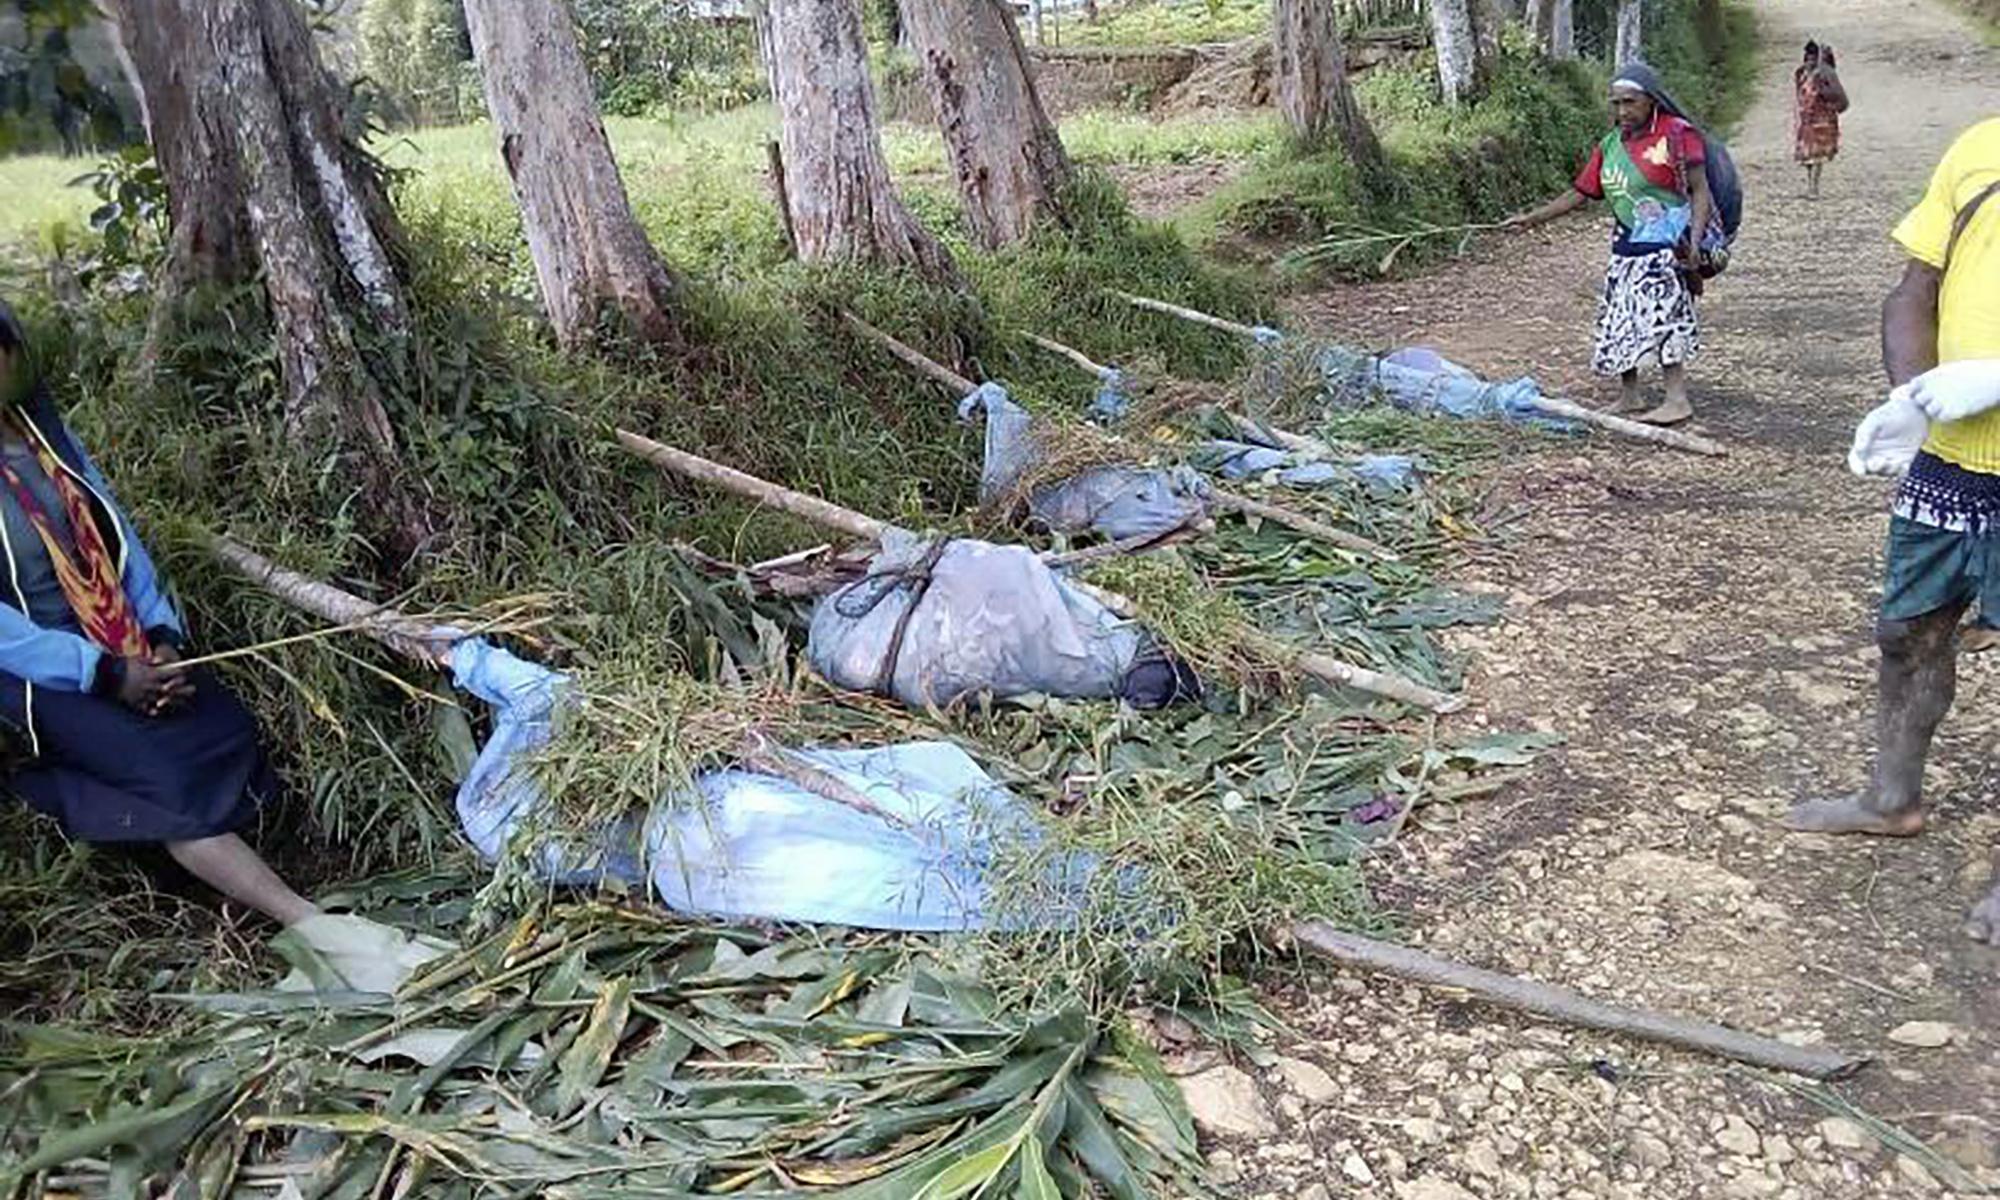 The Karida massacre: fears of a new era of tribal violence in Papua New Guinea